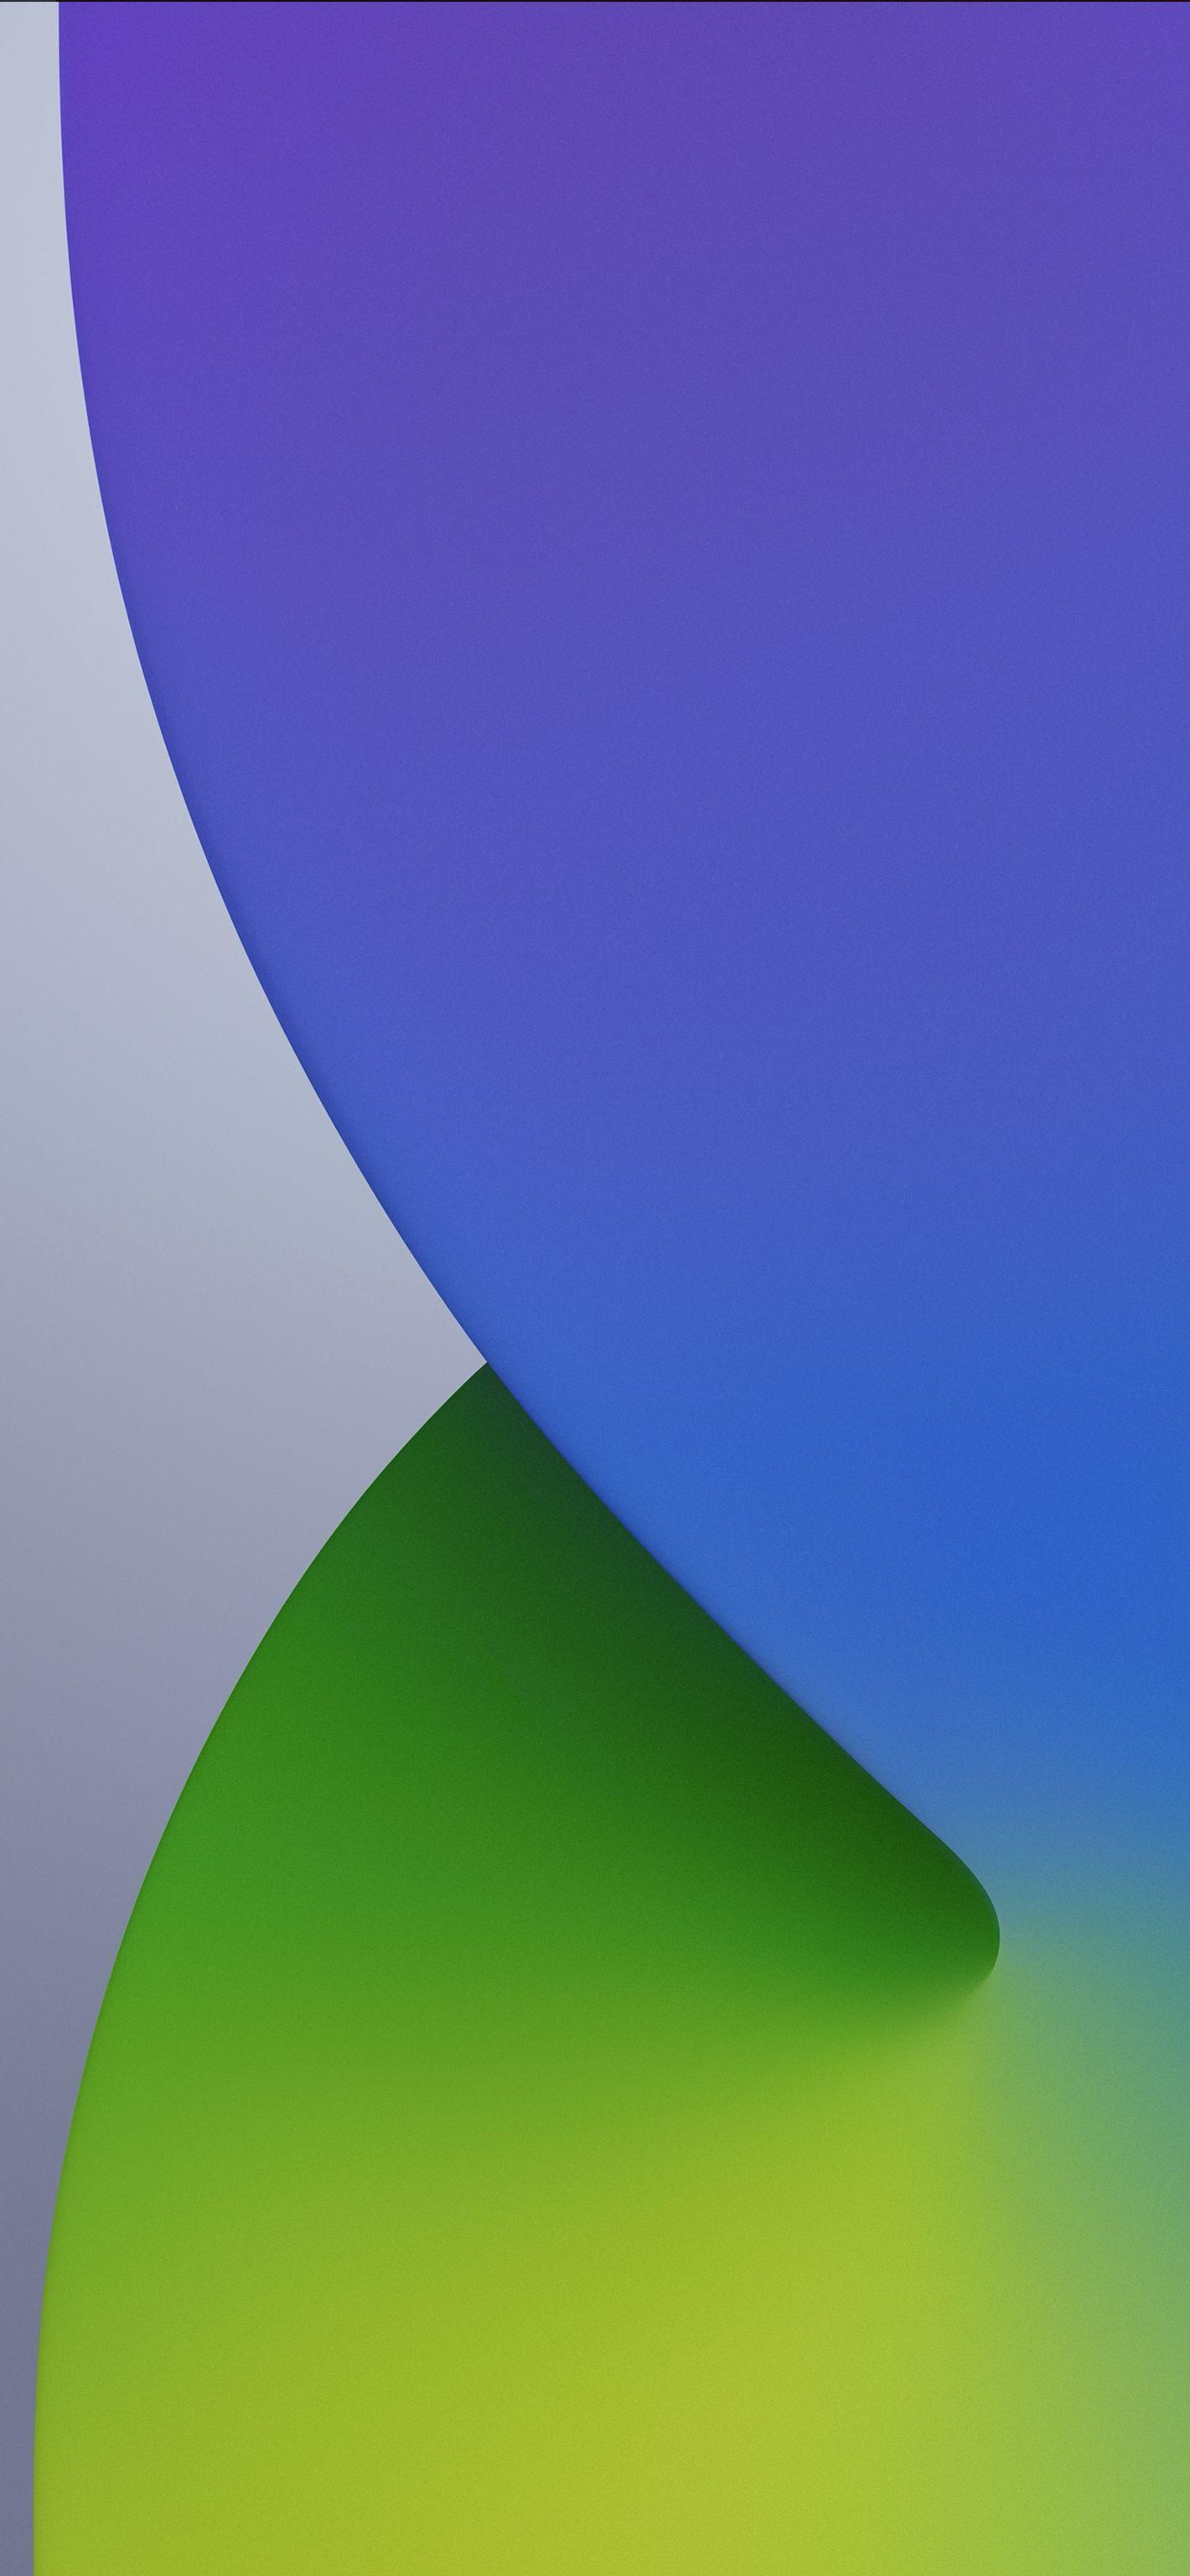 Pin by Steve Milk on Wallpapers in 2020 Ios 14 wallpaper